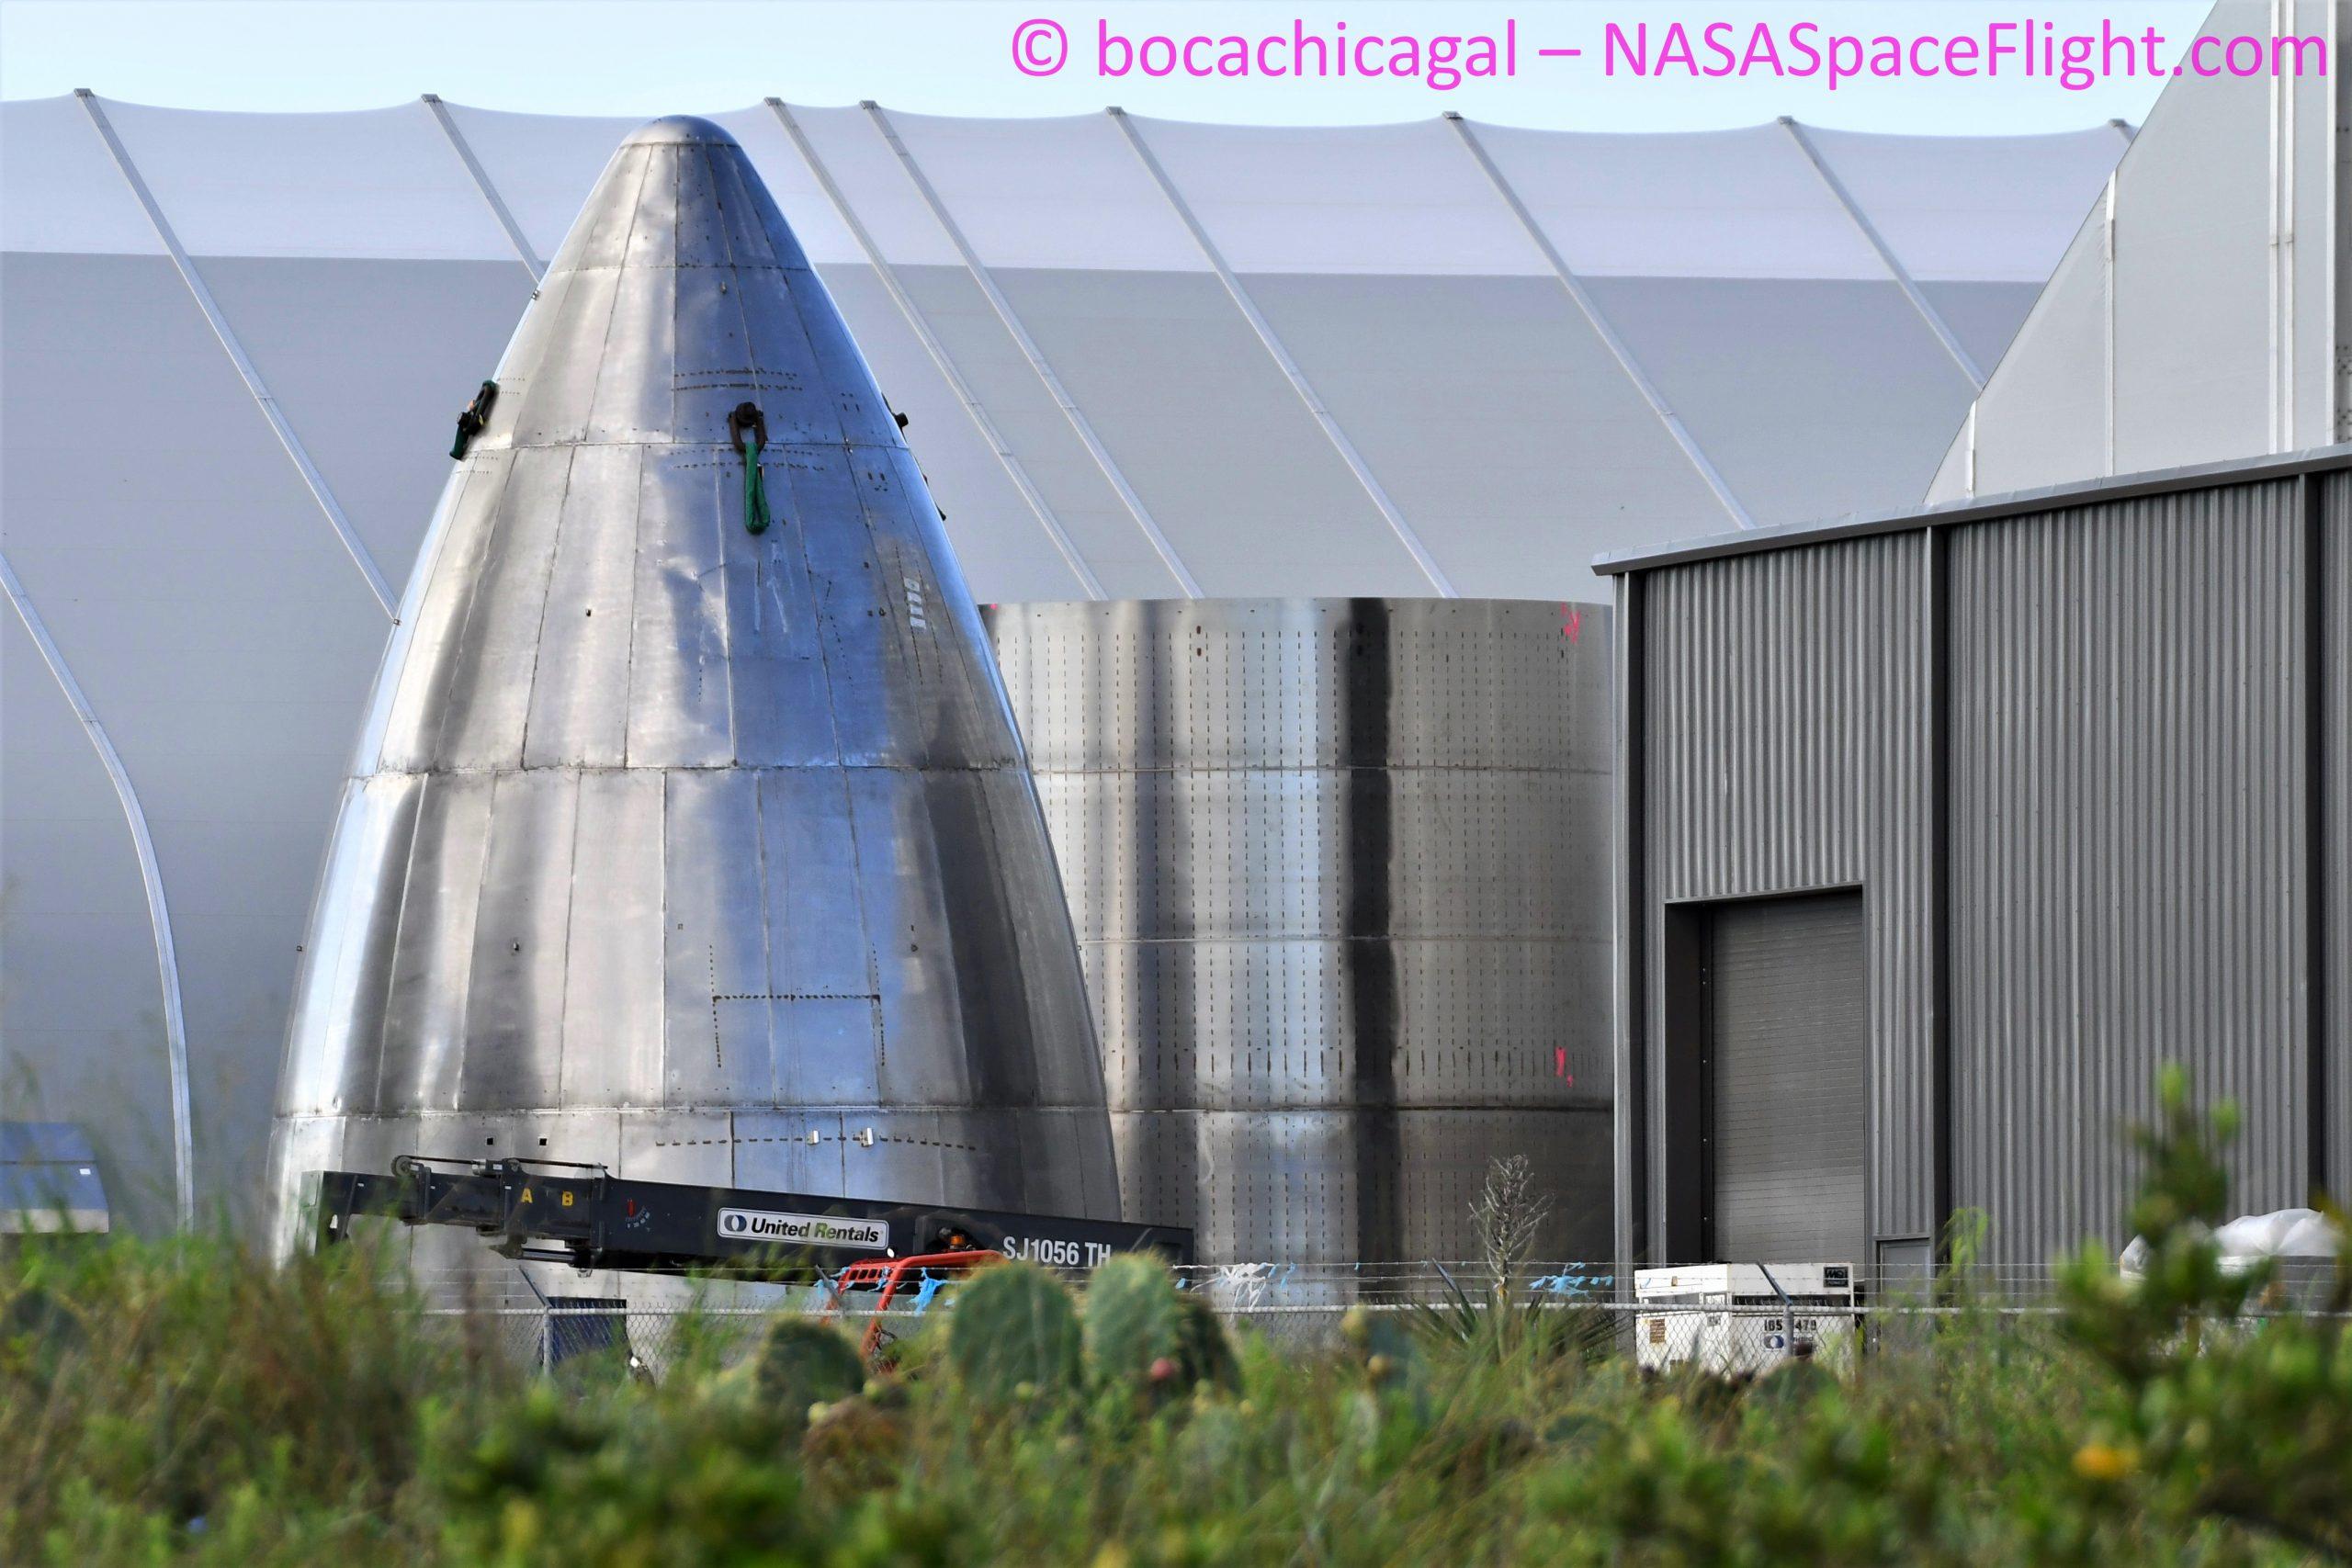 Starship Boca Chica 080520 (NASASpaceflight – bocachicagal) nose + ring work 1